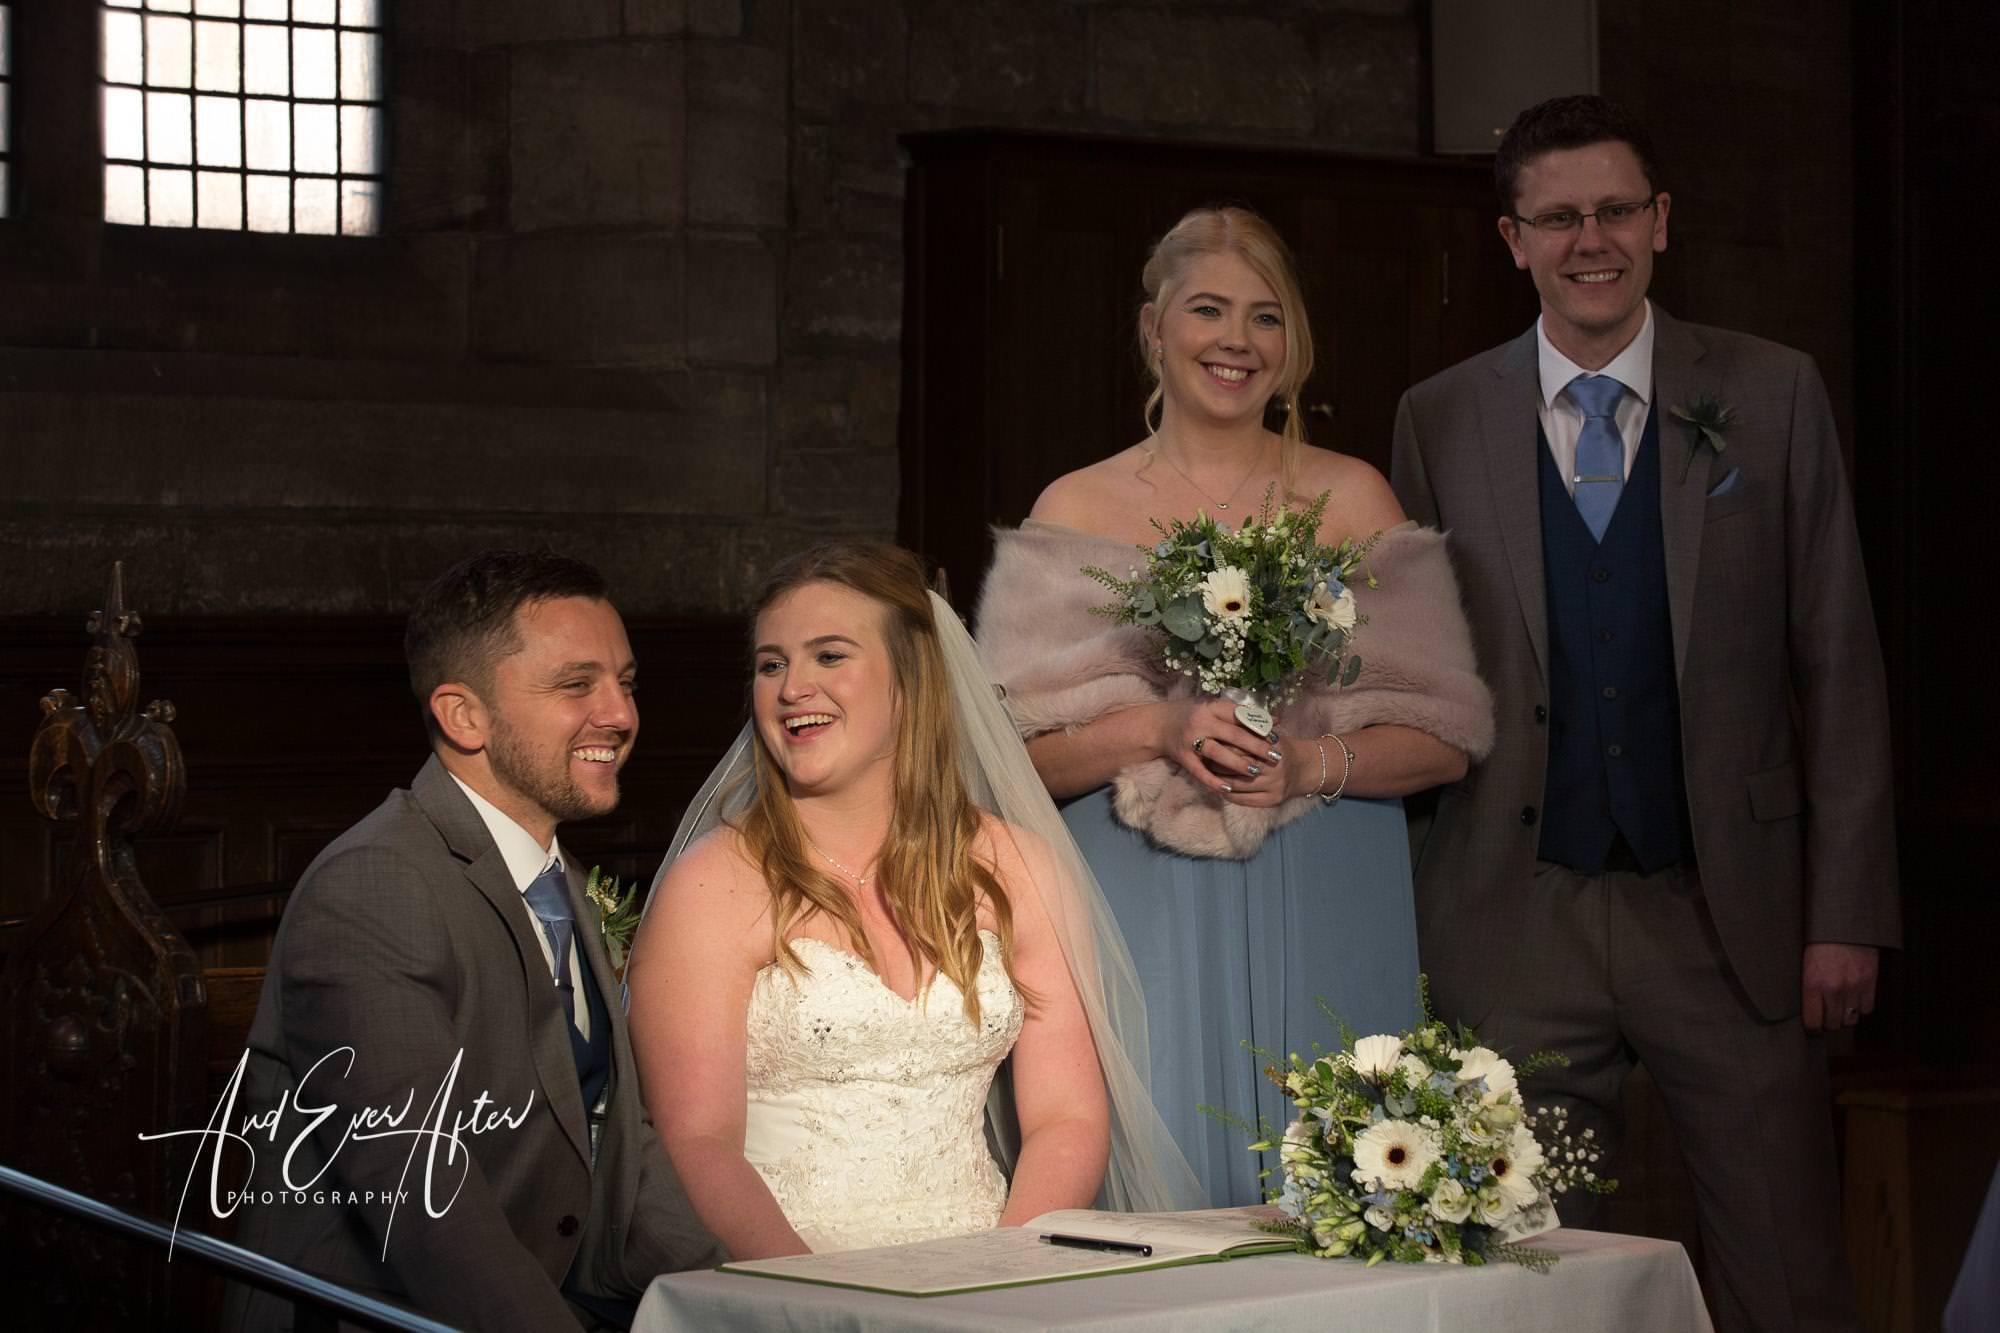 wedding register, best man, bridesmaid, bride, groom